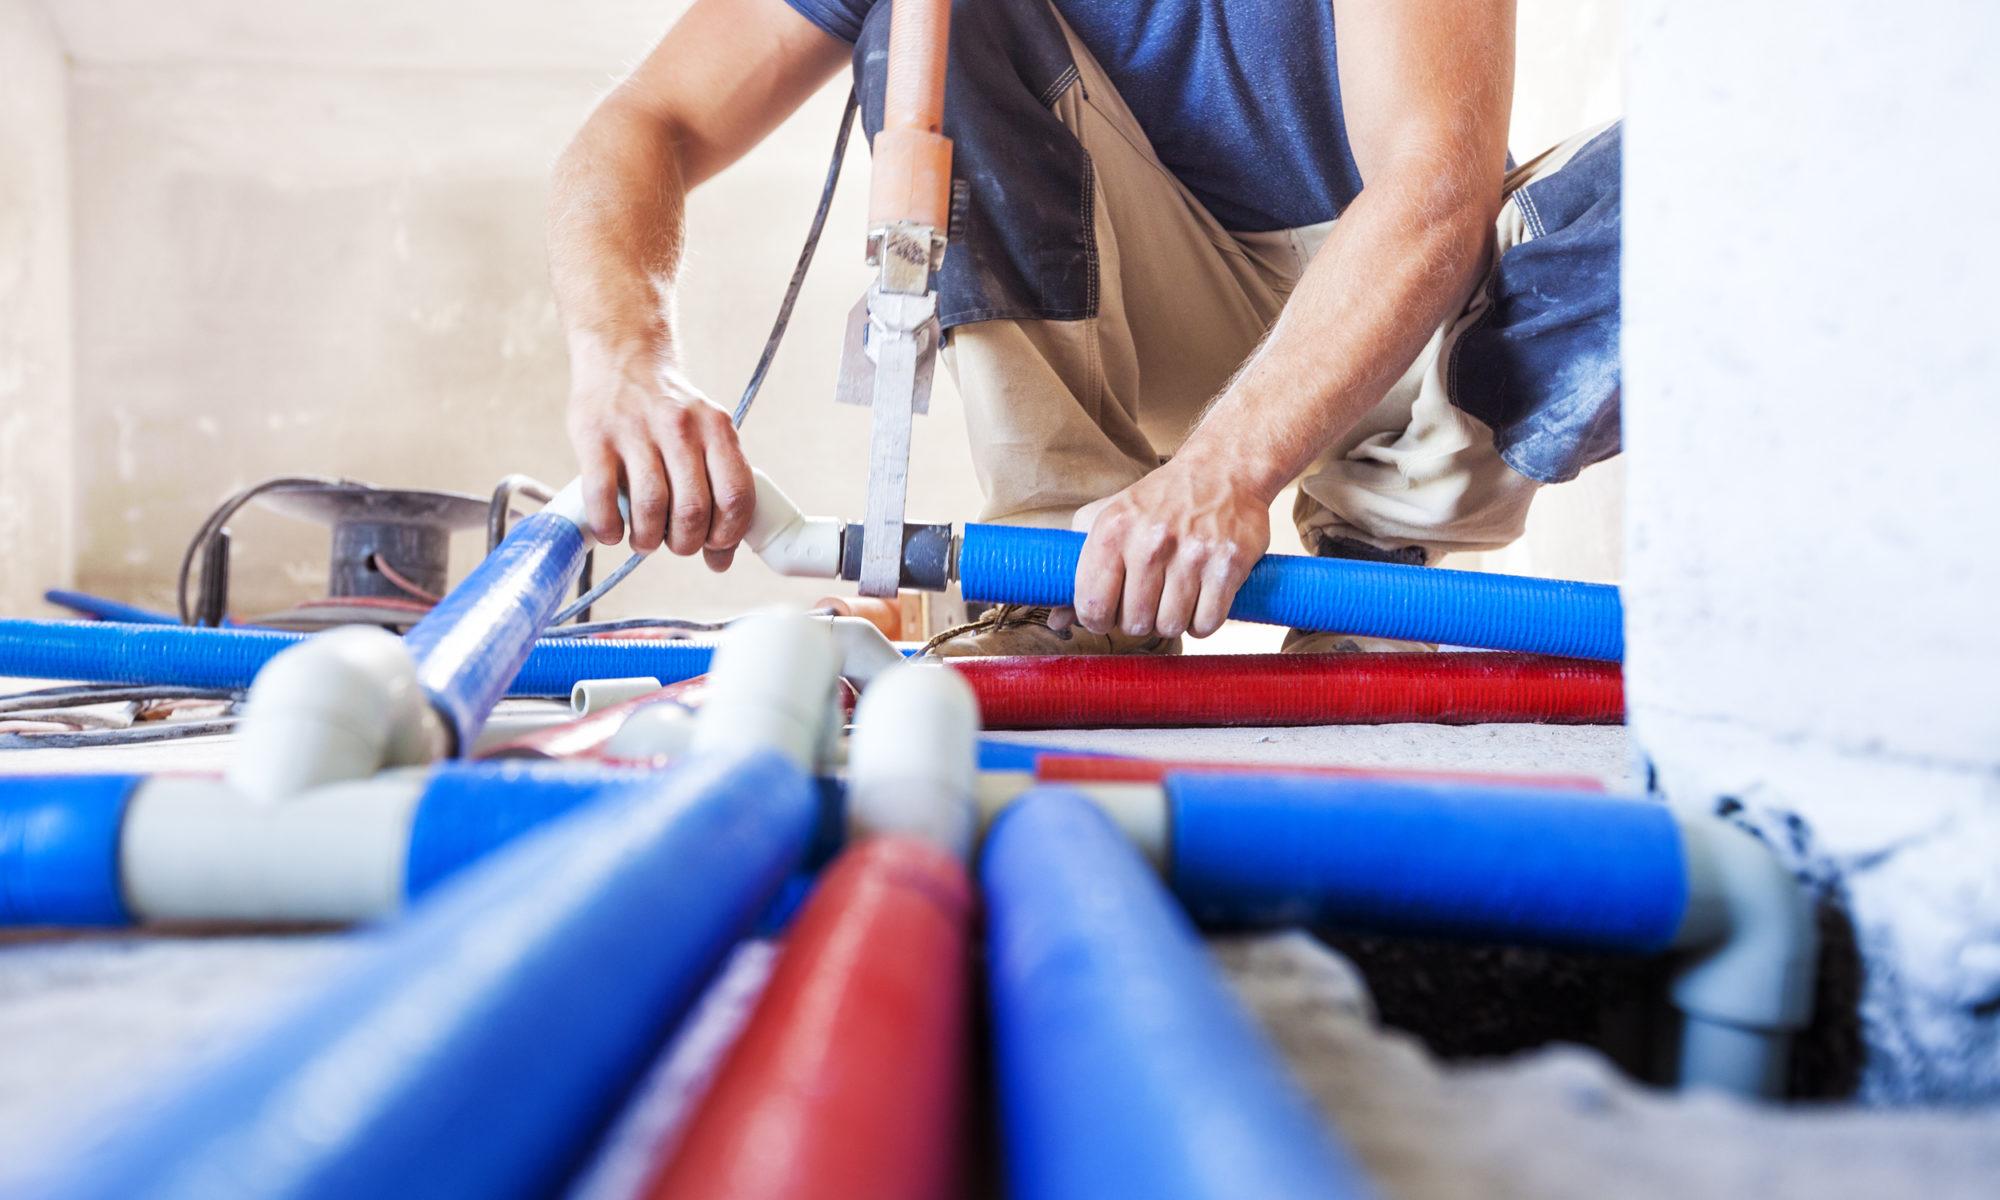 plumbing & drainage mistakes